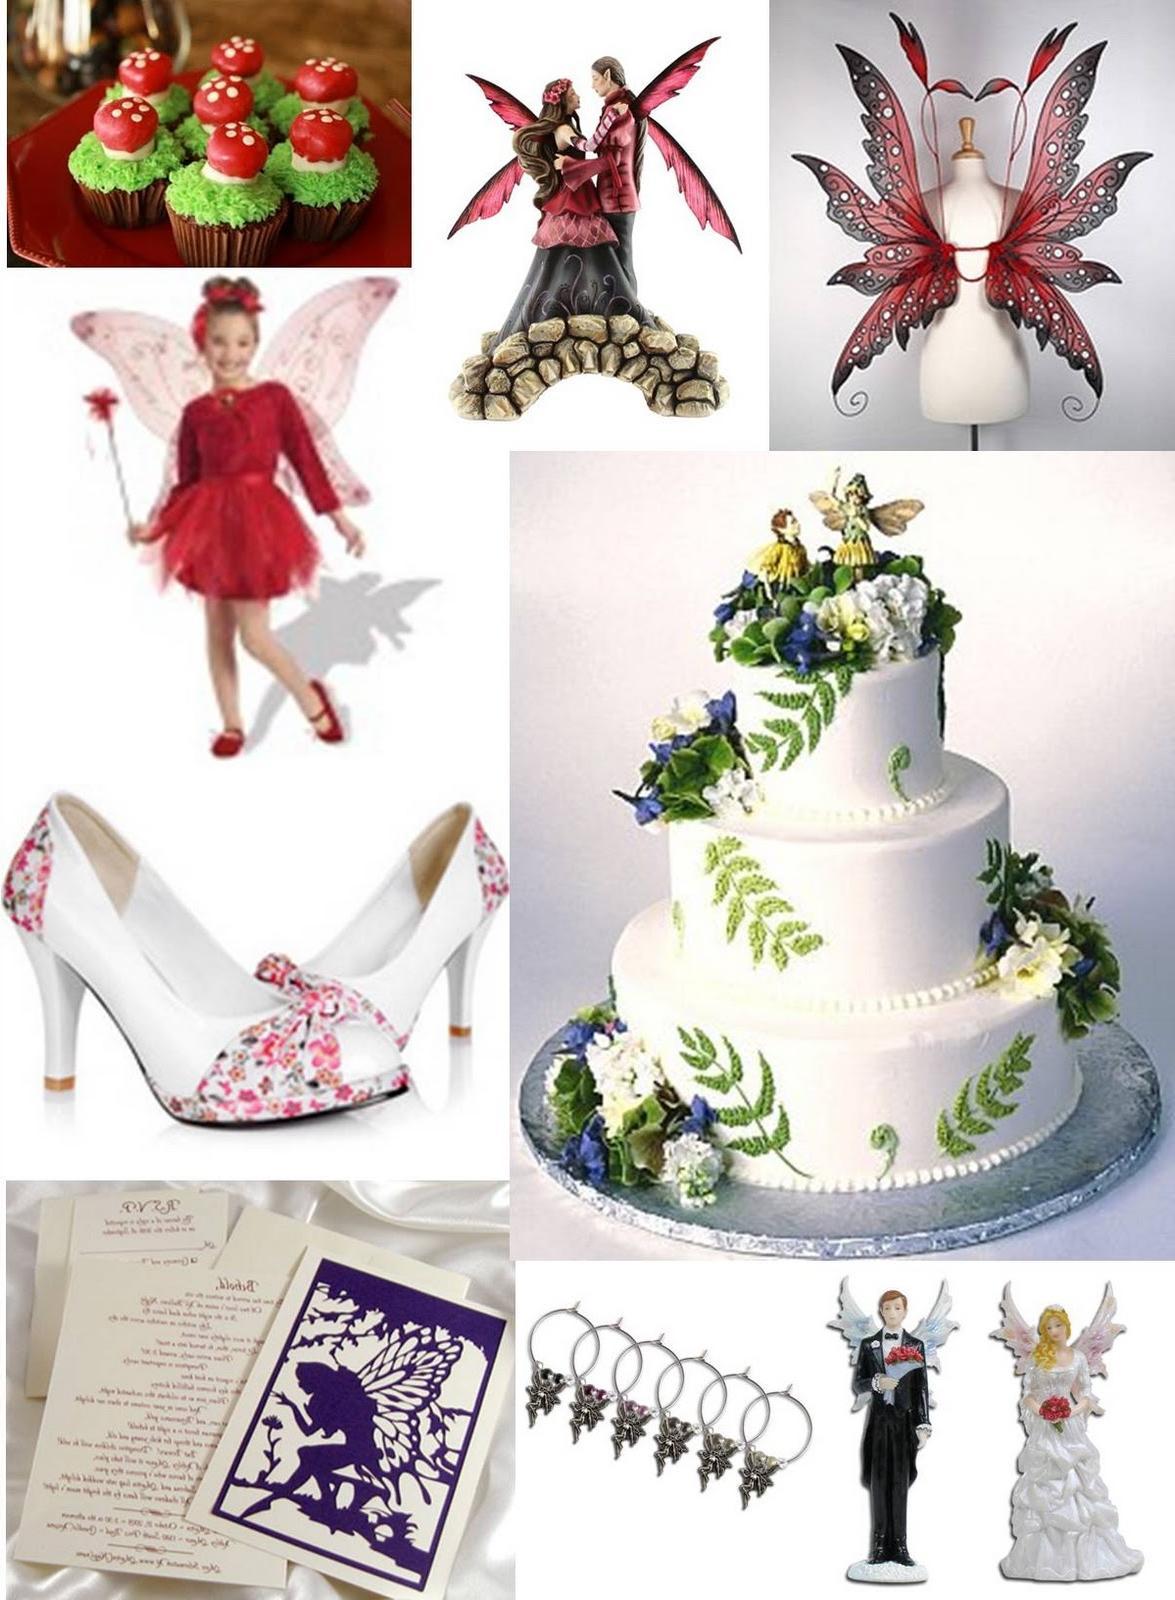 Kevilynn\'s blog: Wedding entrance, floral arch